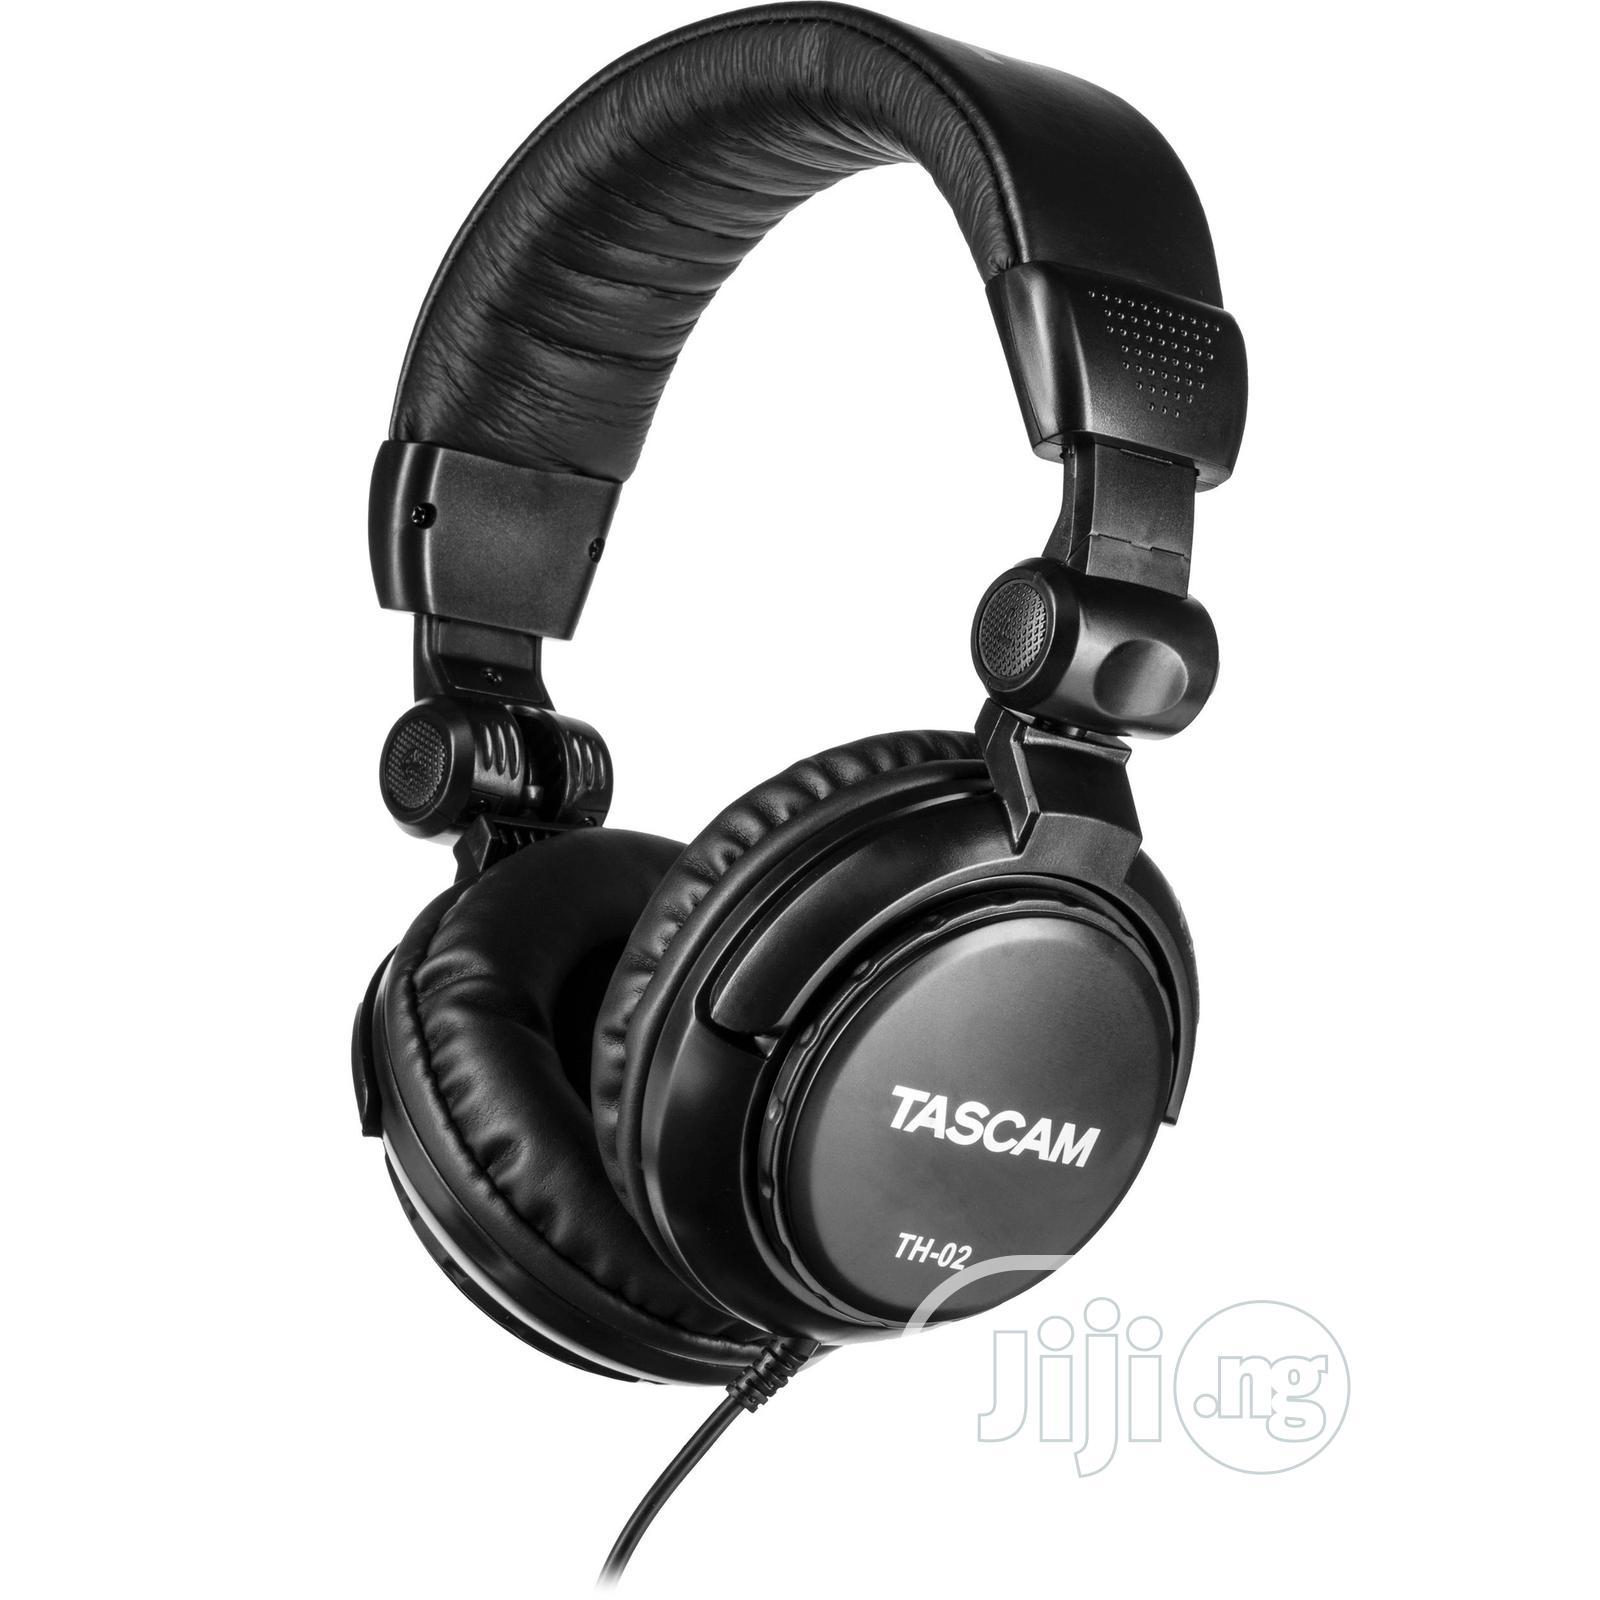 Archive: Tascam TH 02 Headphone